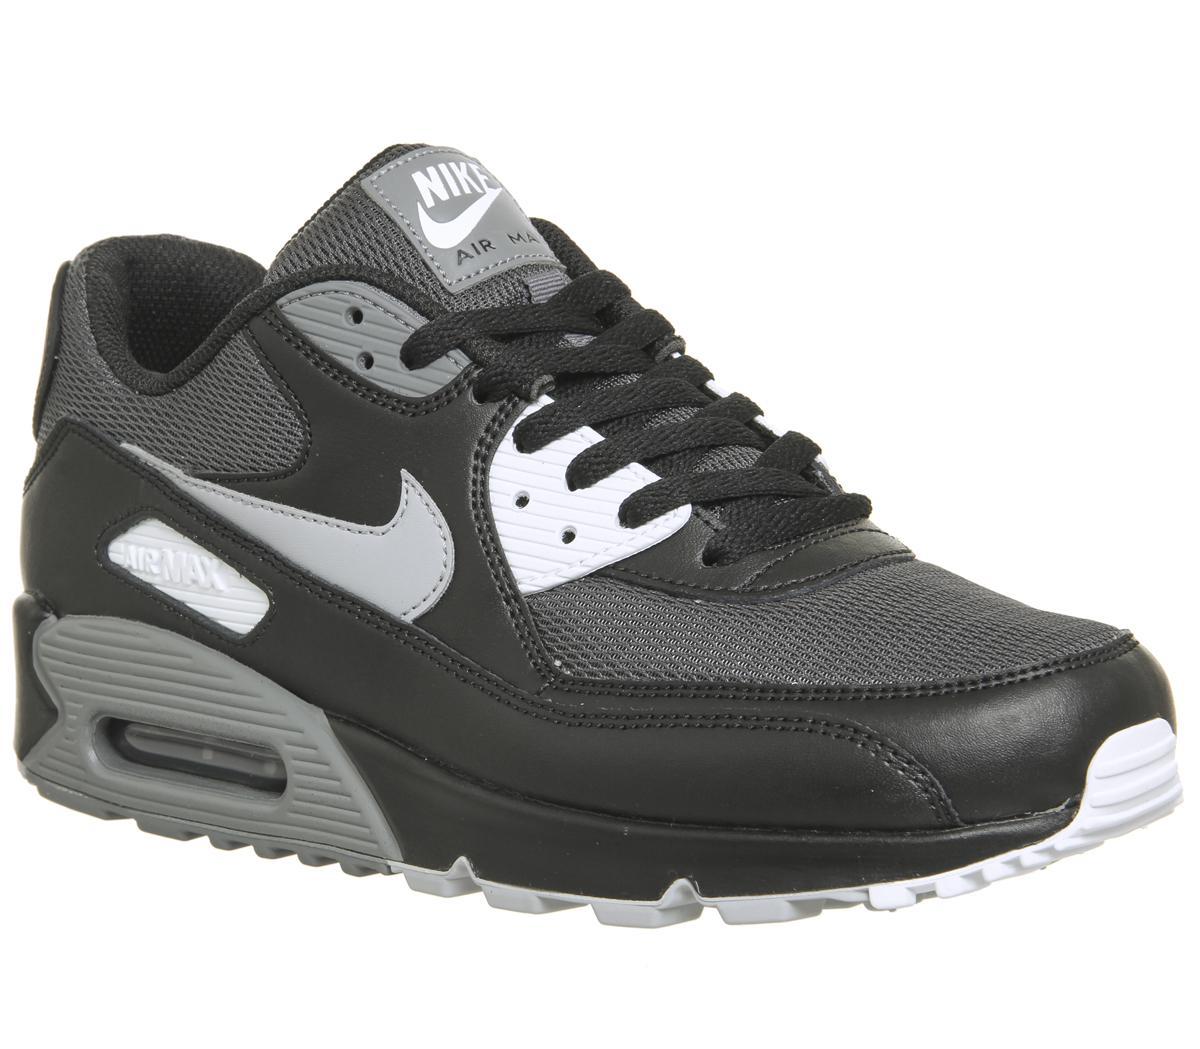 Nike Air Max 90 Trainers Black Wolf